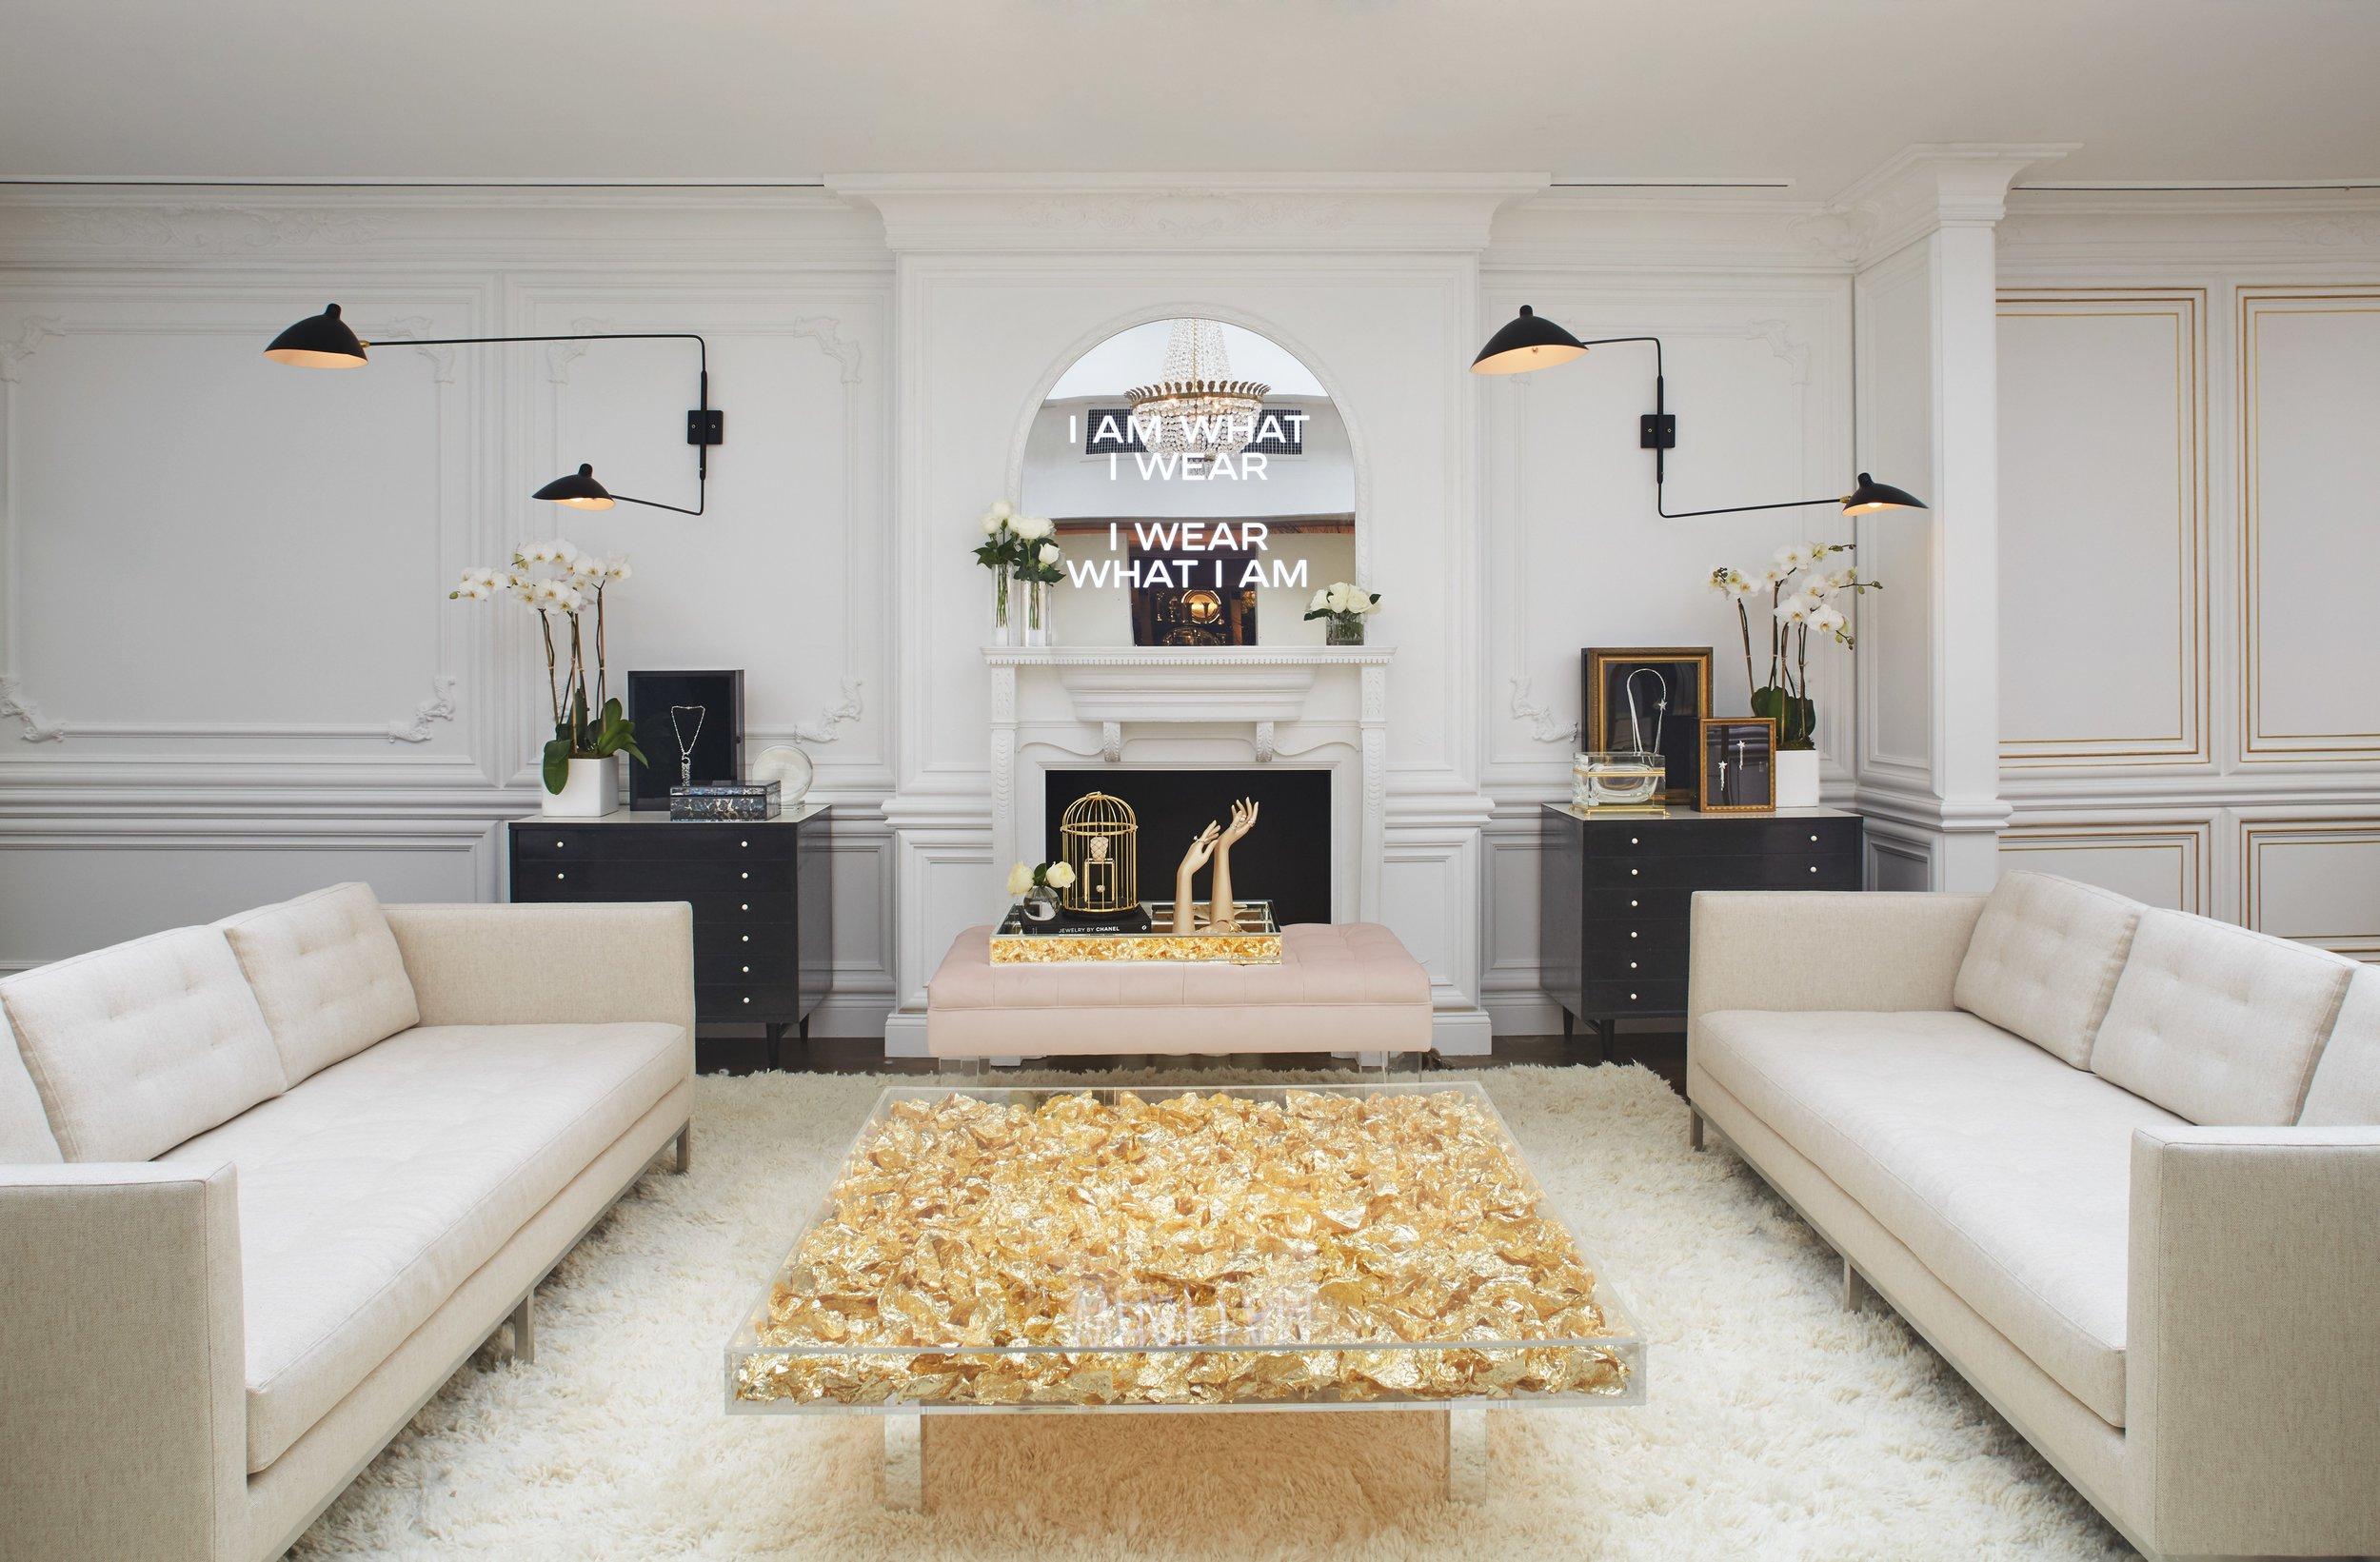 Chanel Boutique @ Bergdorf Goodman | Architectural Digest